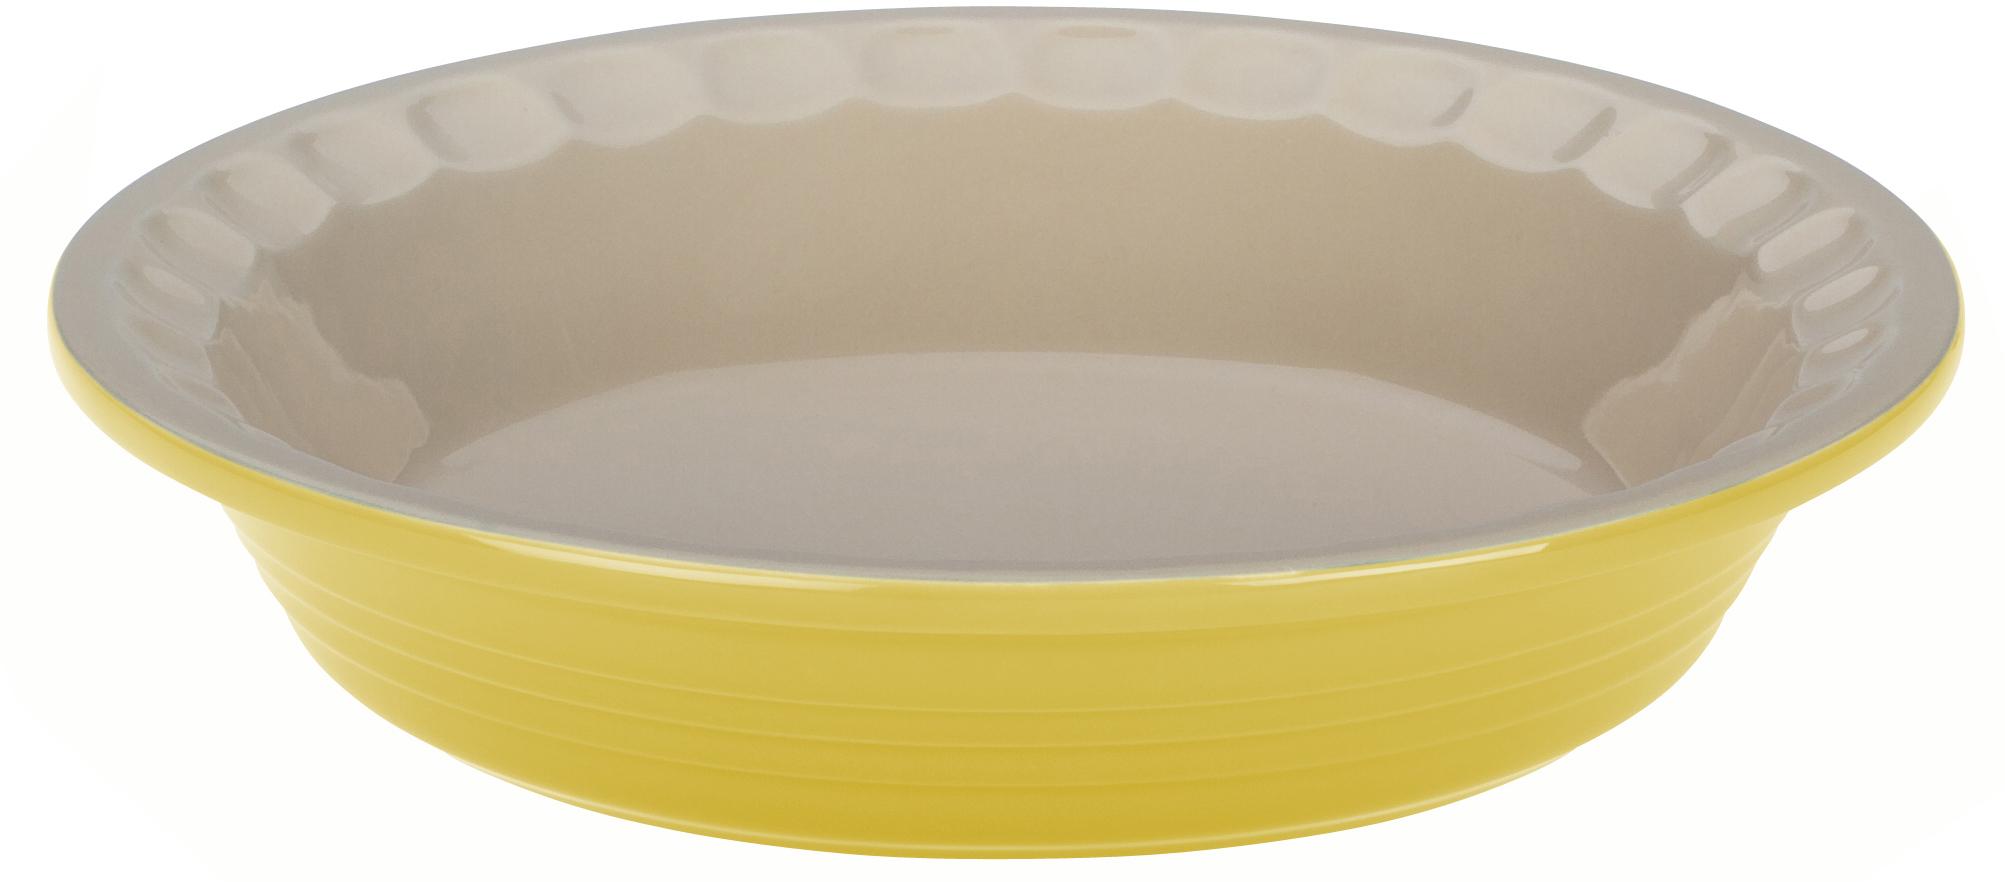 Le Creuset Heritage Soleil Yellow Stoneware Pie Pan, 9 Inch